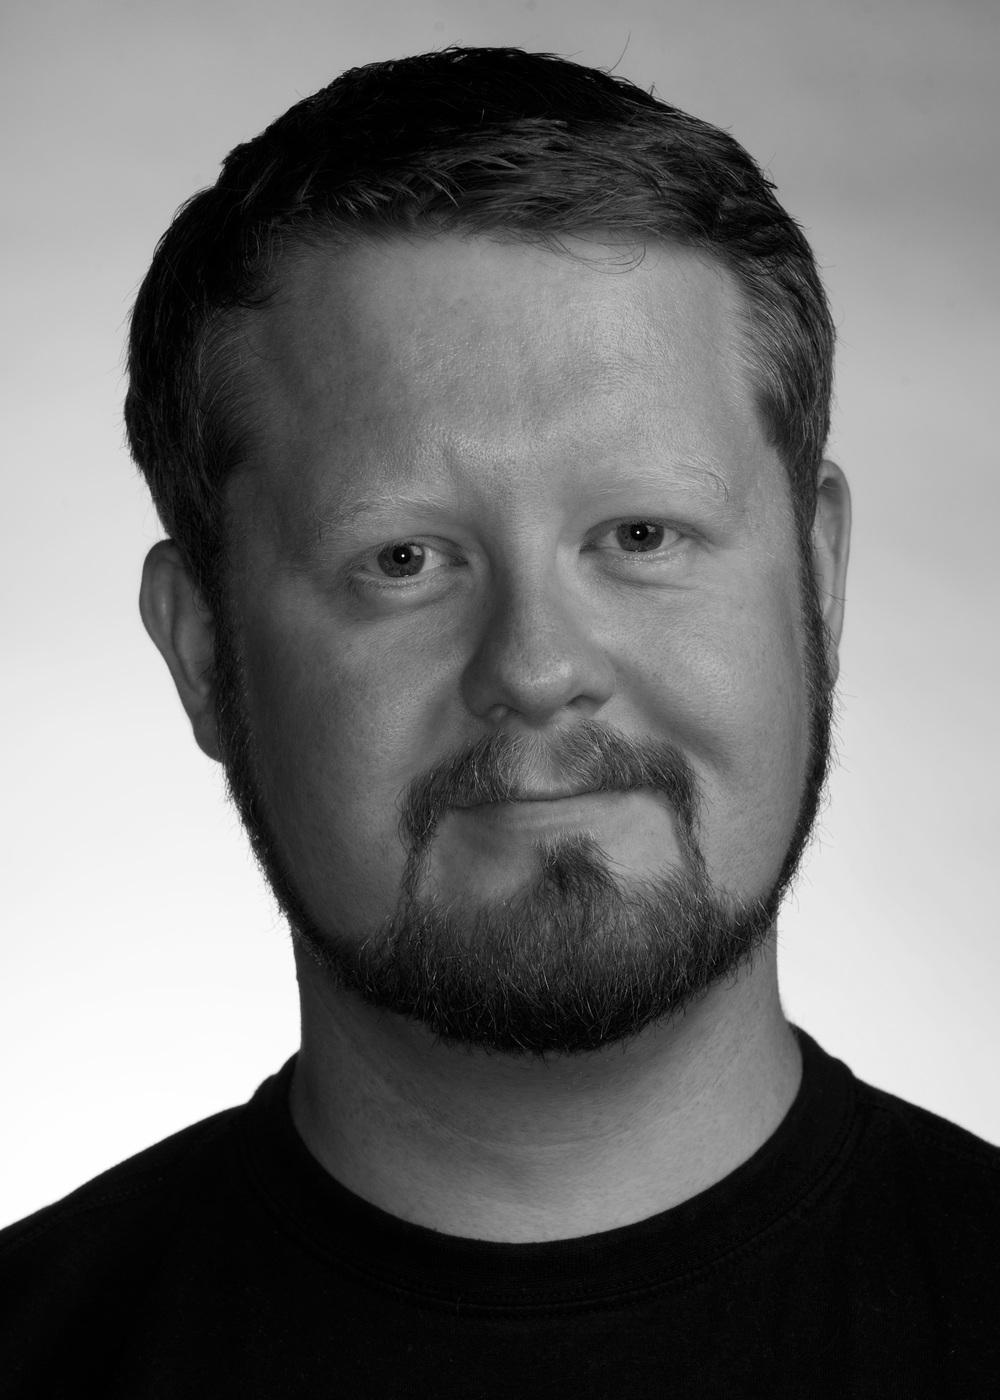 Jens-Erik Aasbø